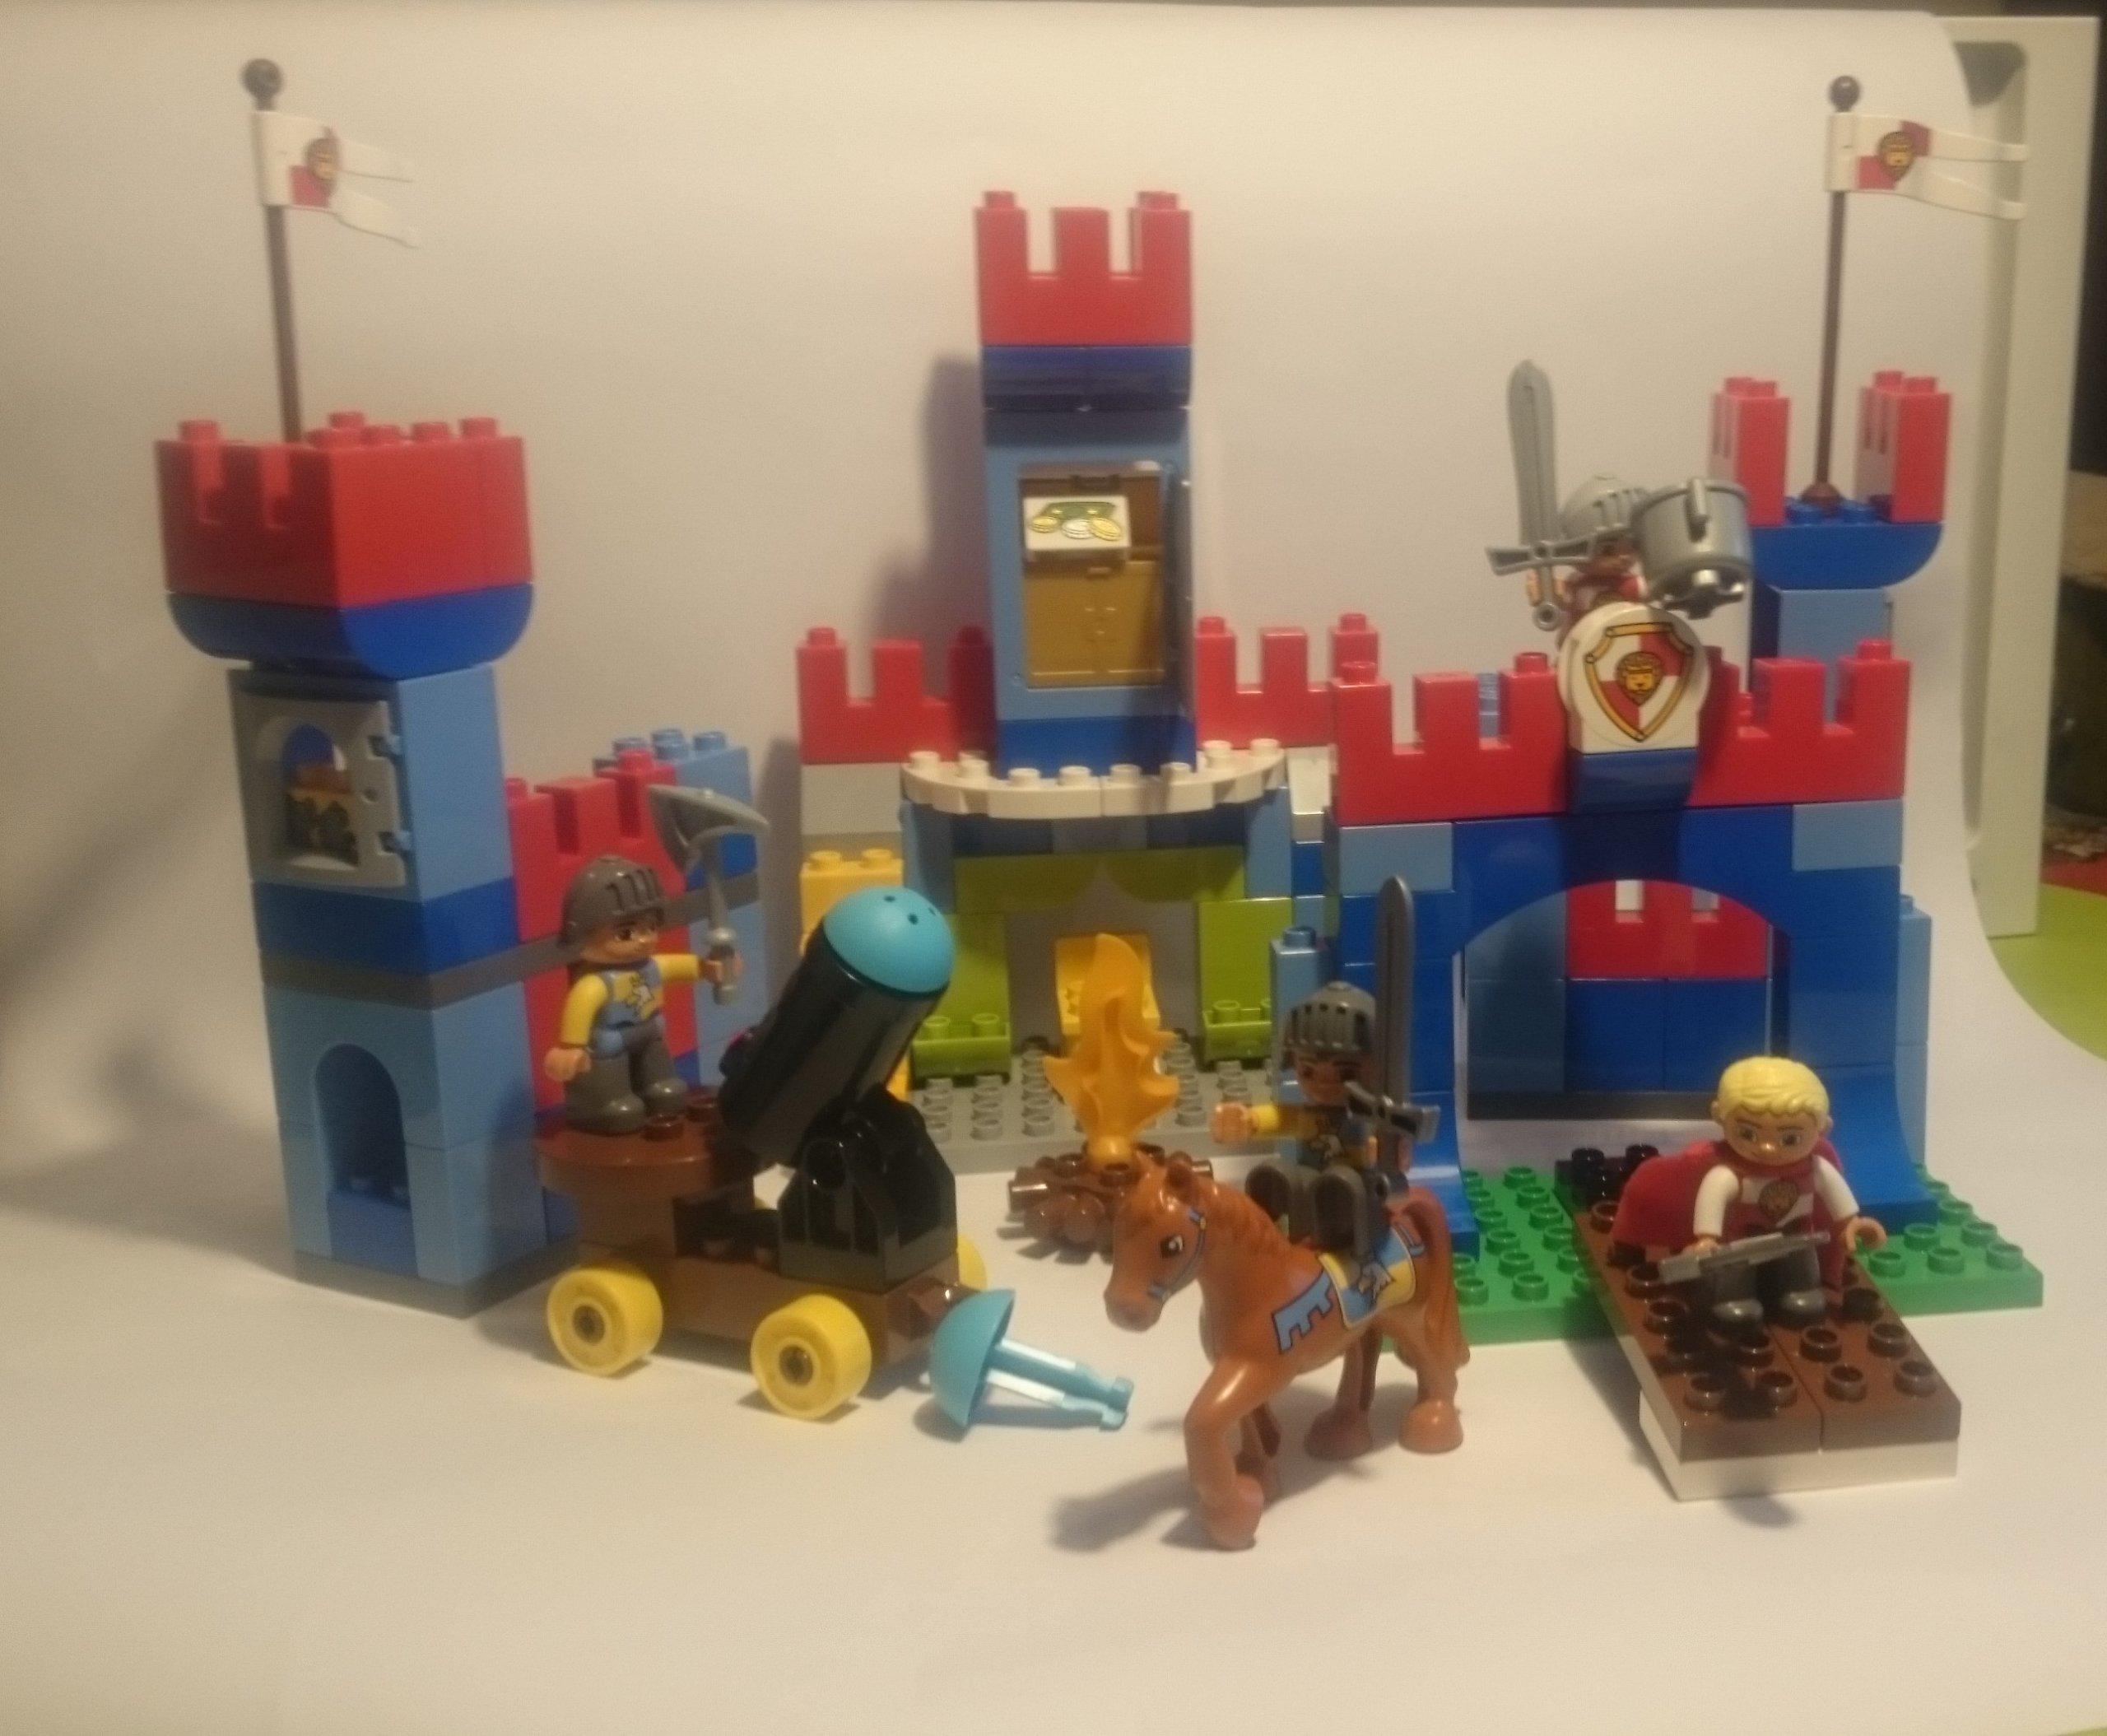 Klocki Lego Duplo Zamek Rycerski 10577 7088009657 Oficjalne